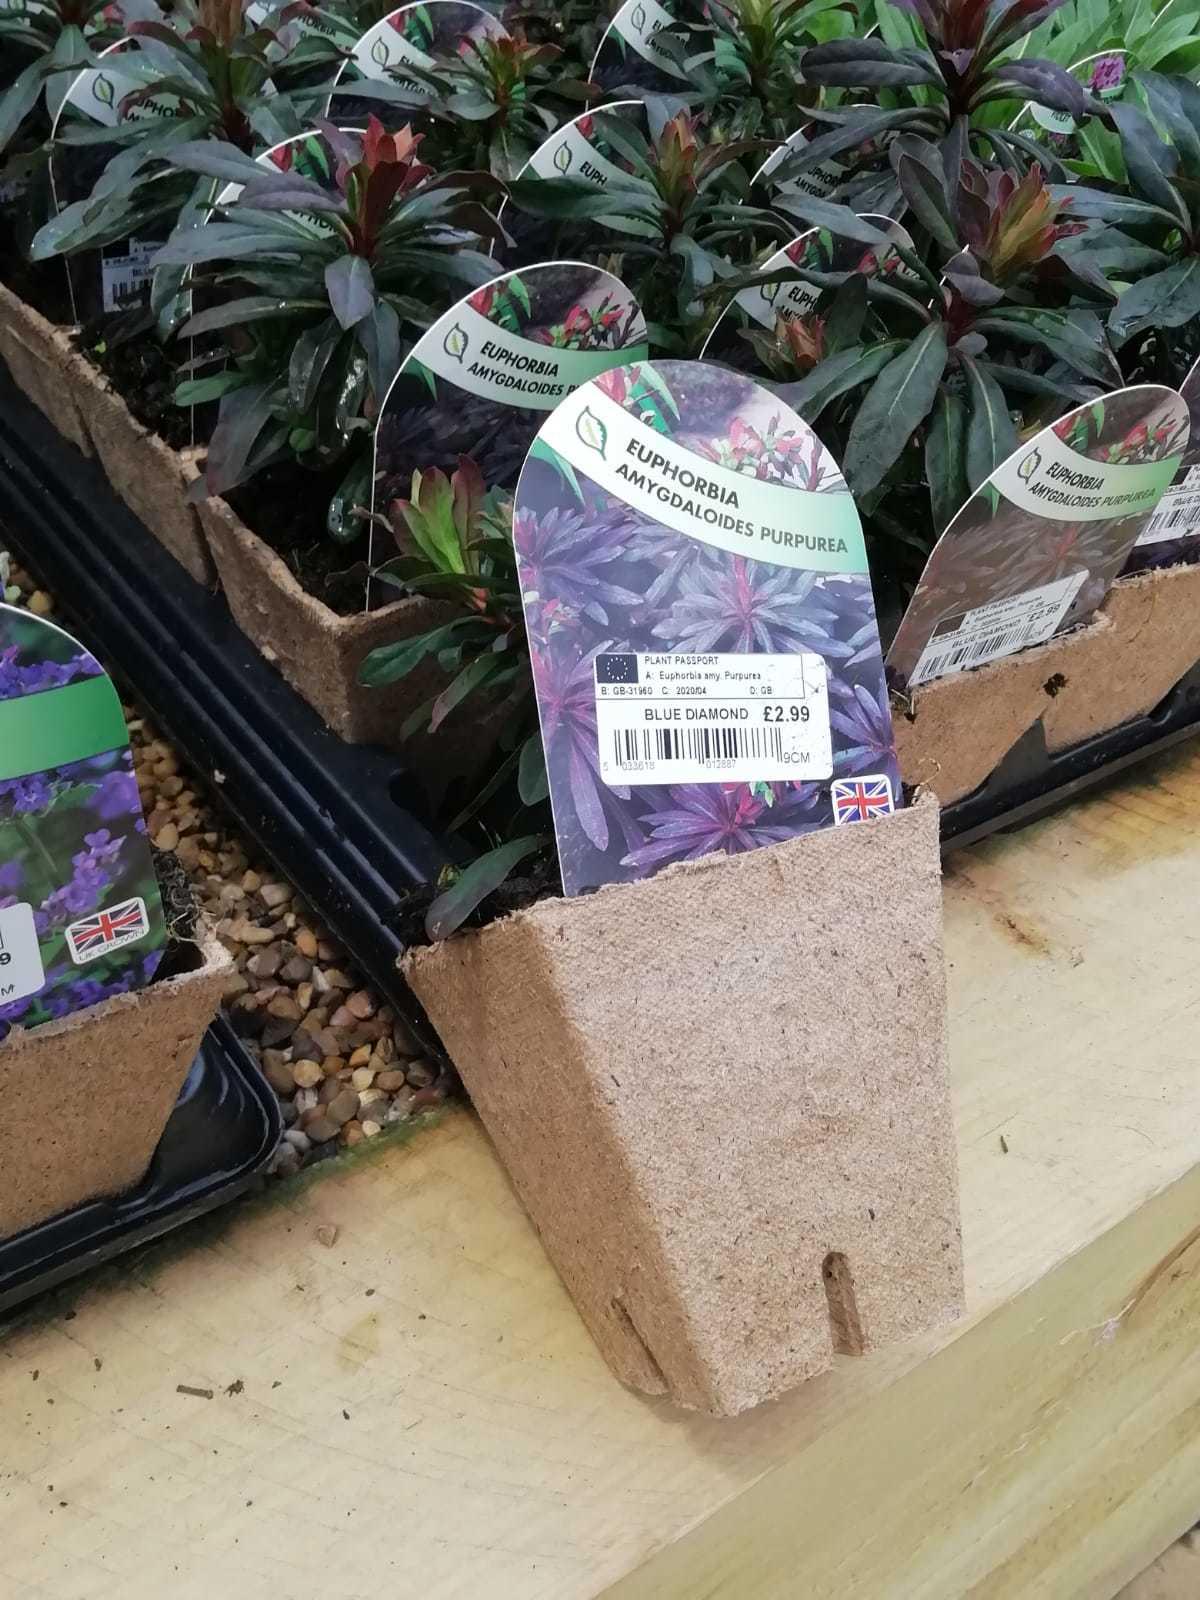 Biodegradable pots help reduce plastic waste